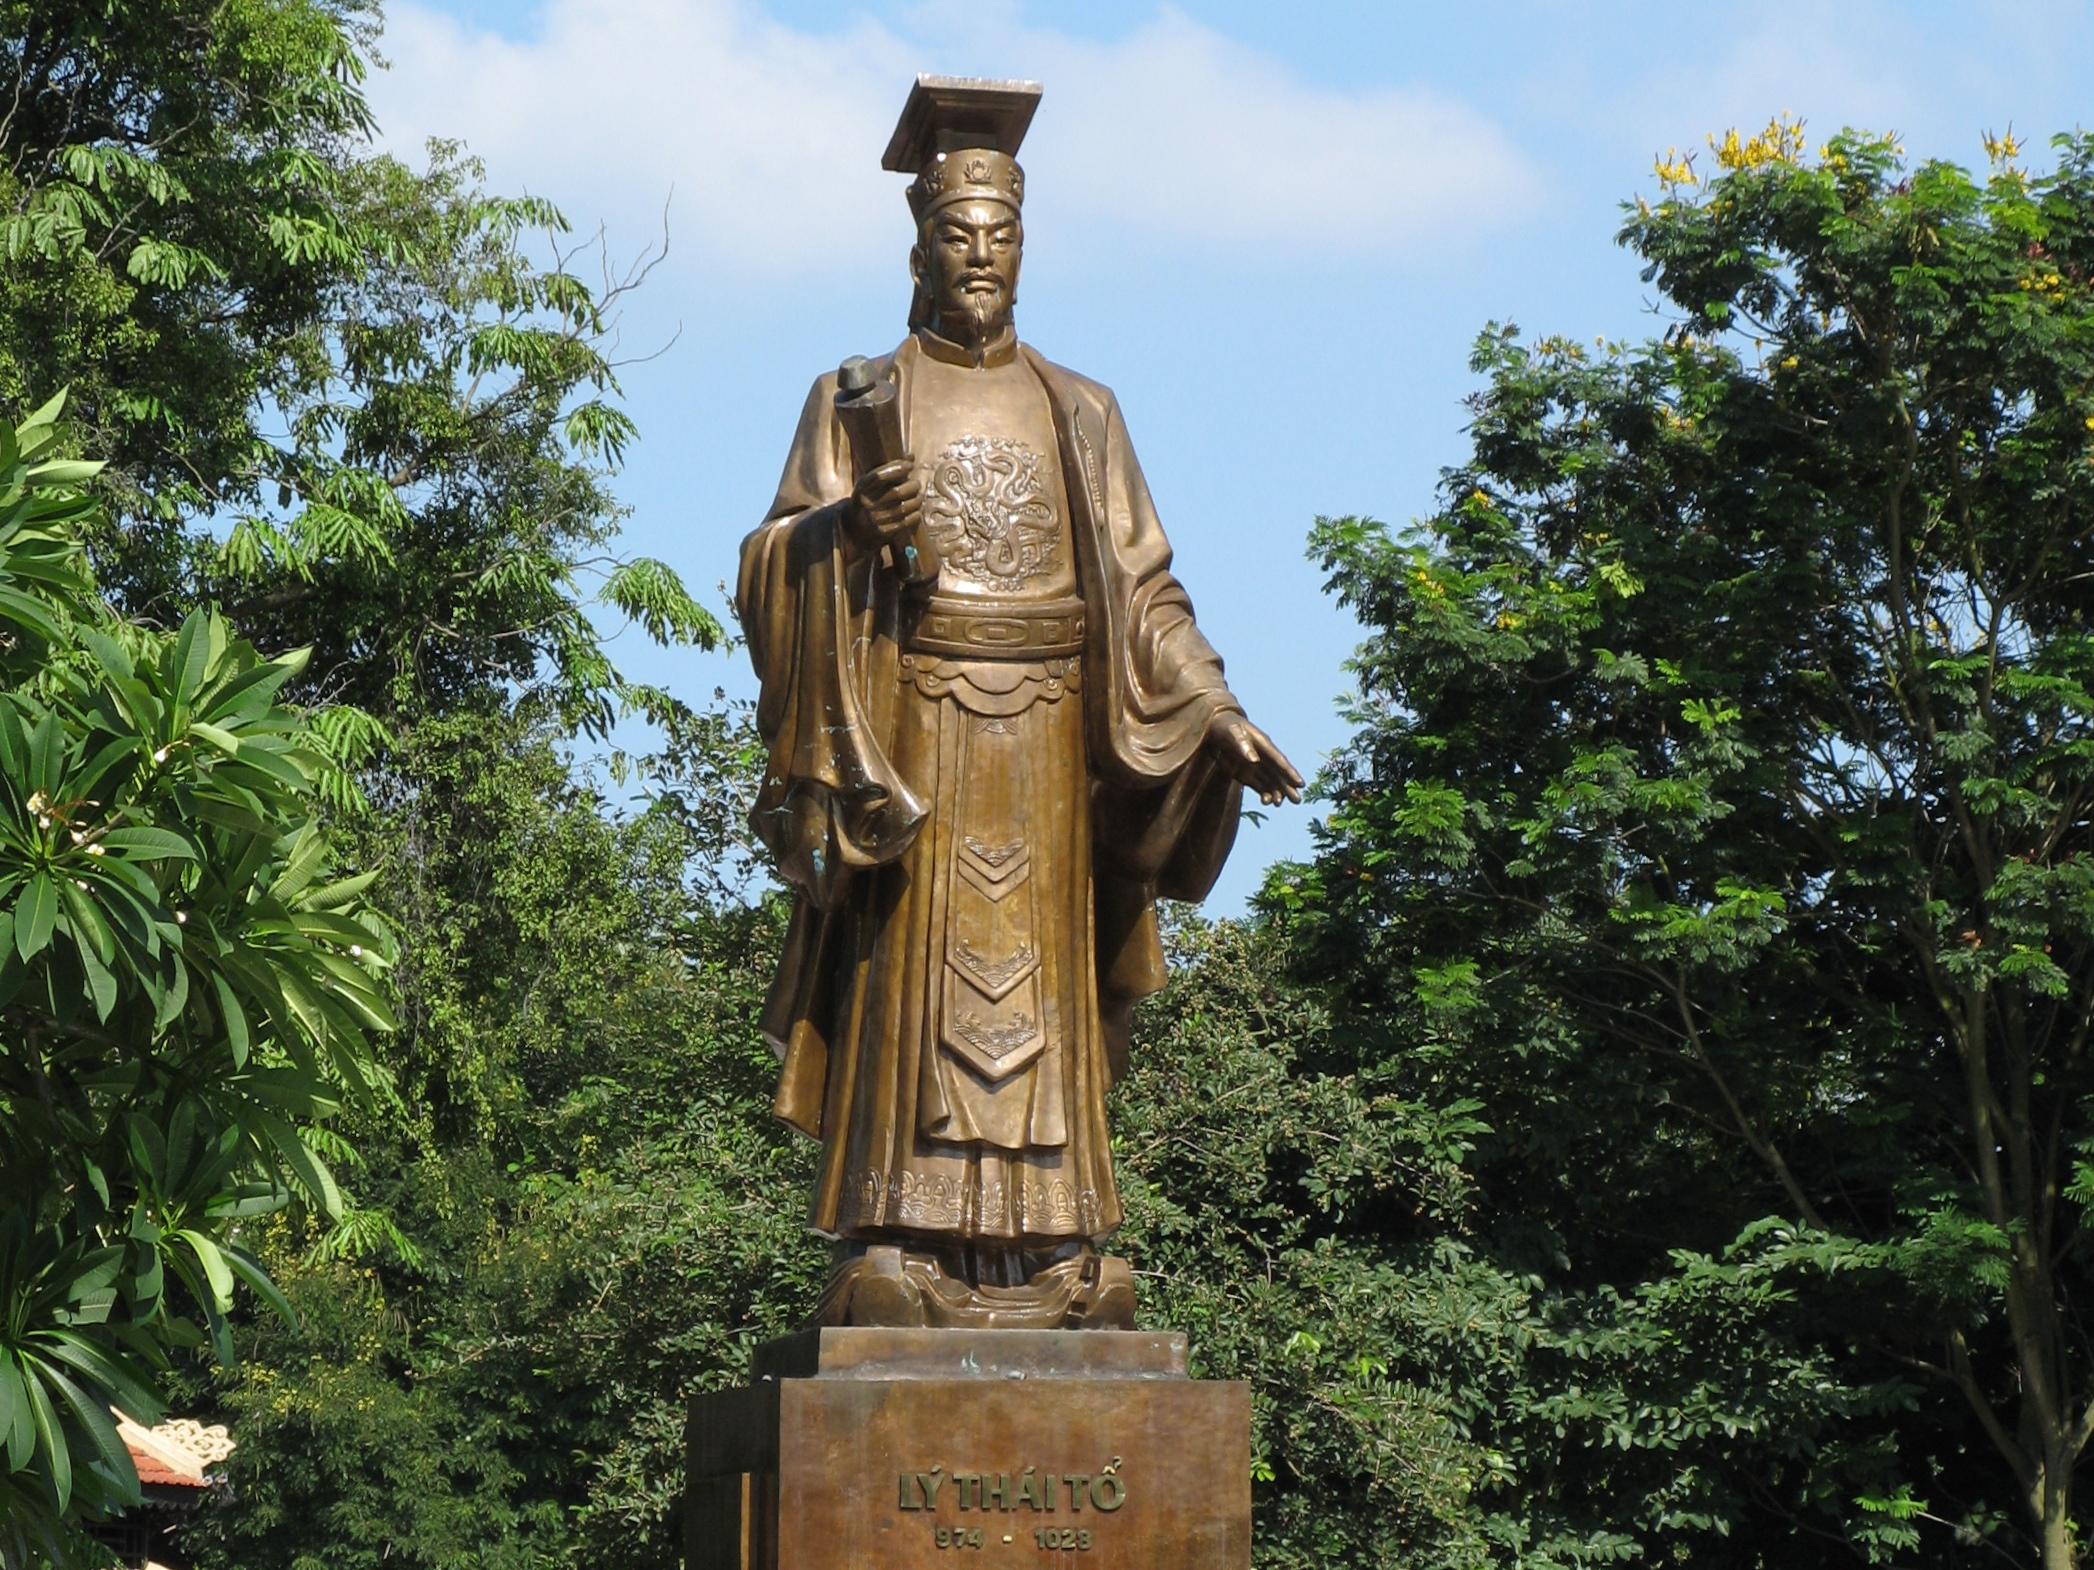 emperor lý thai tổ made thăng long hanoi his capital